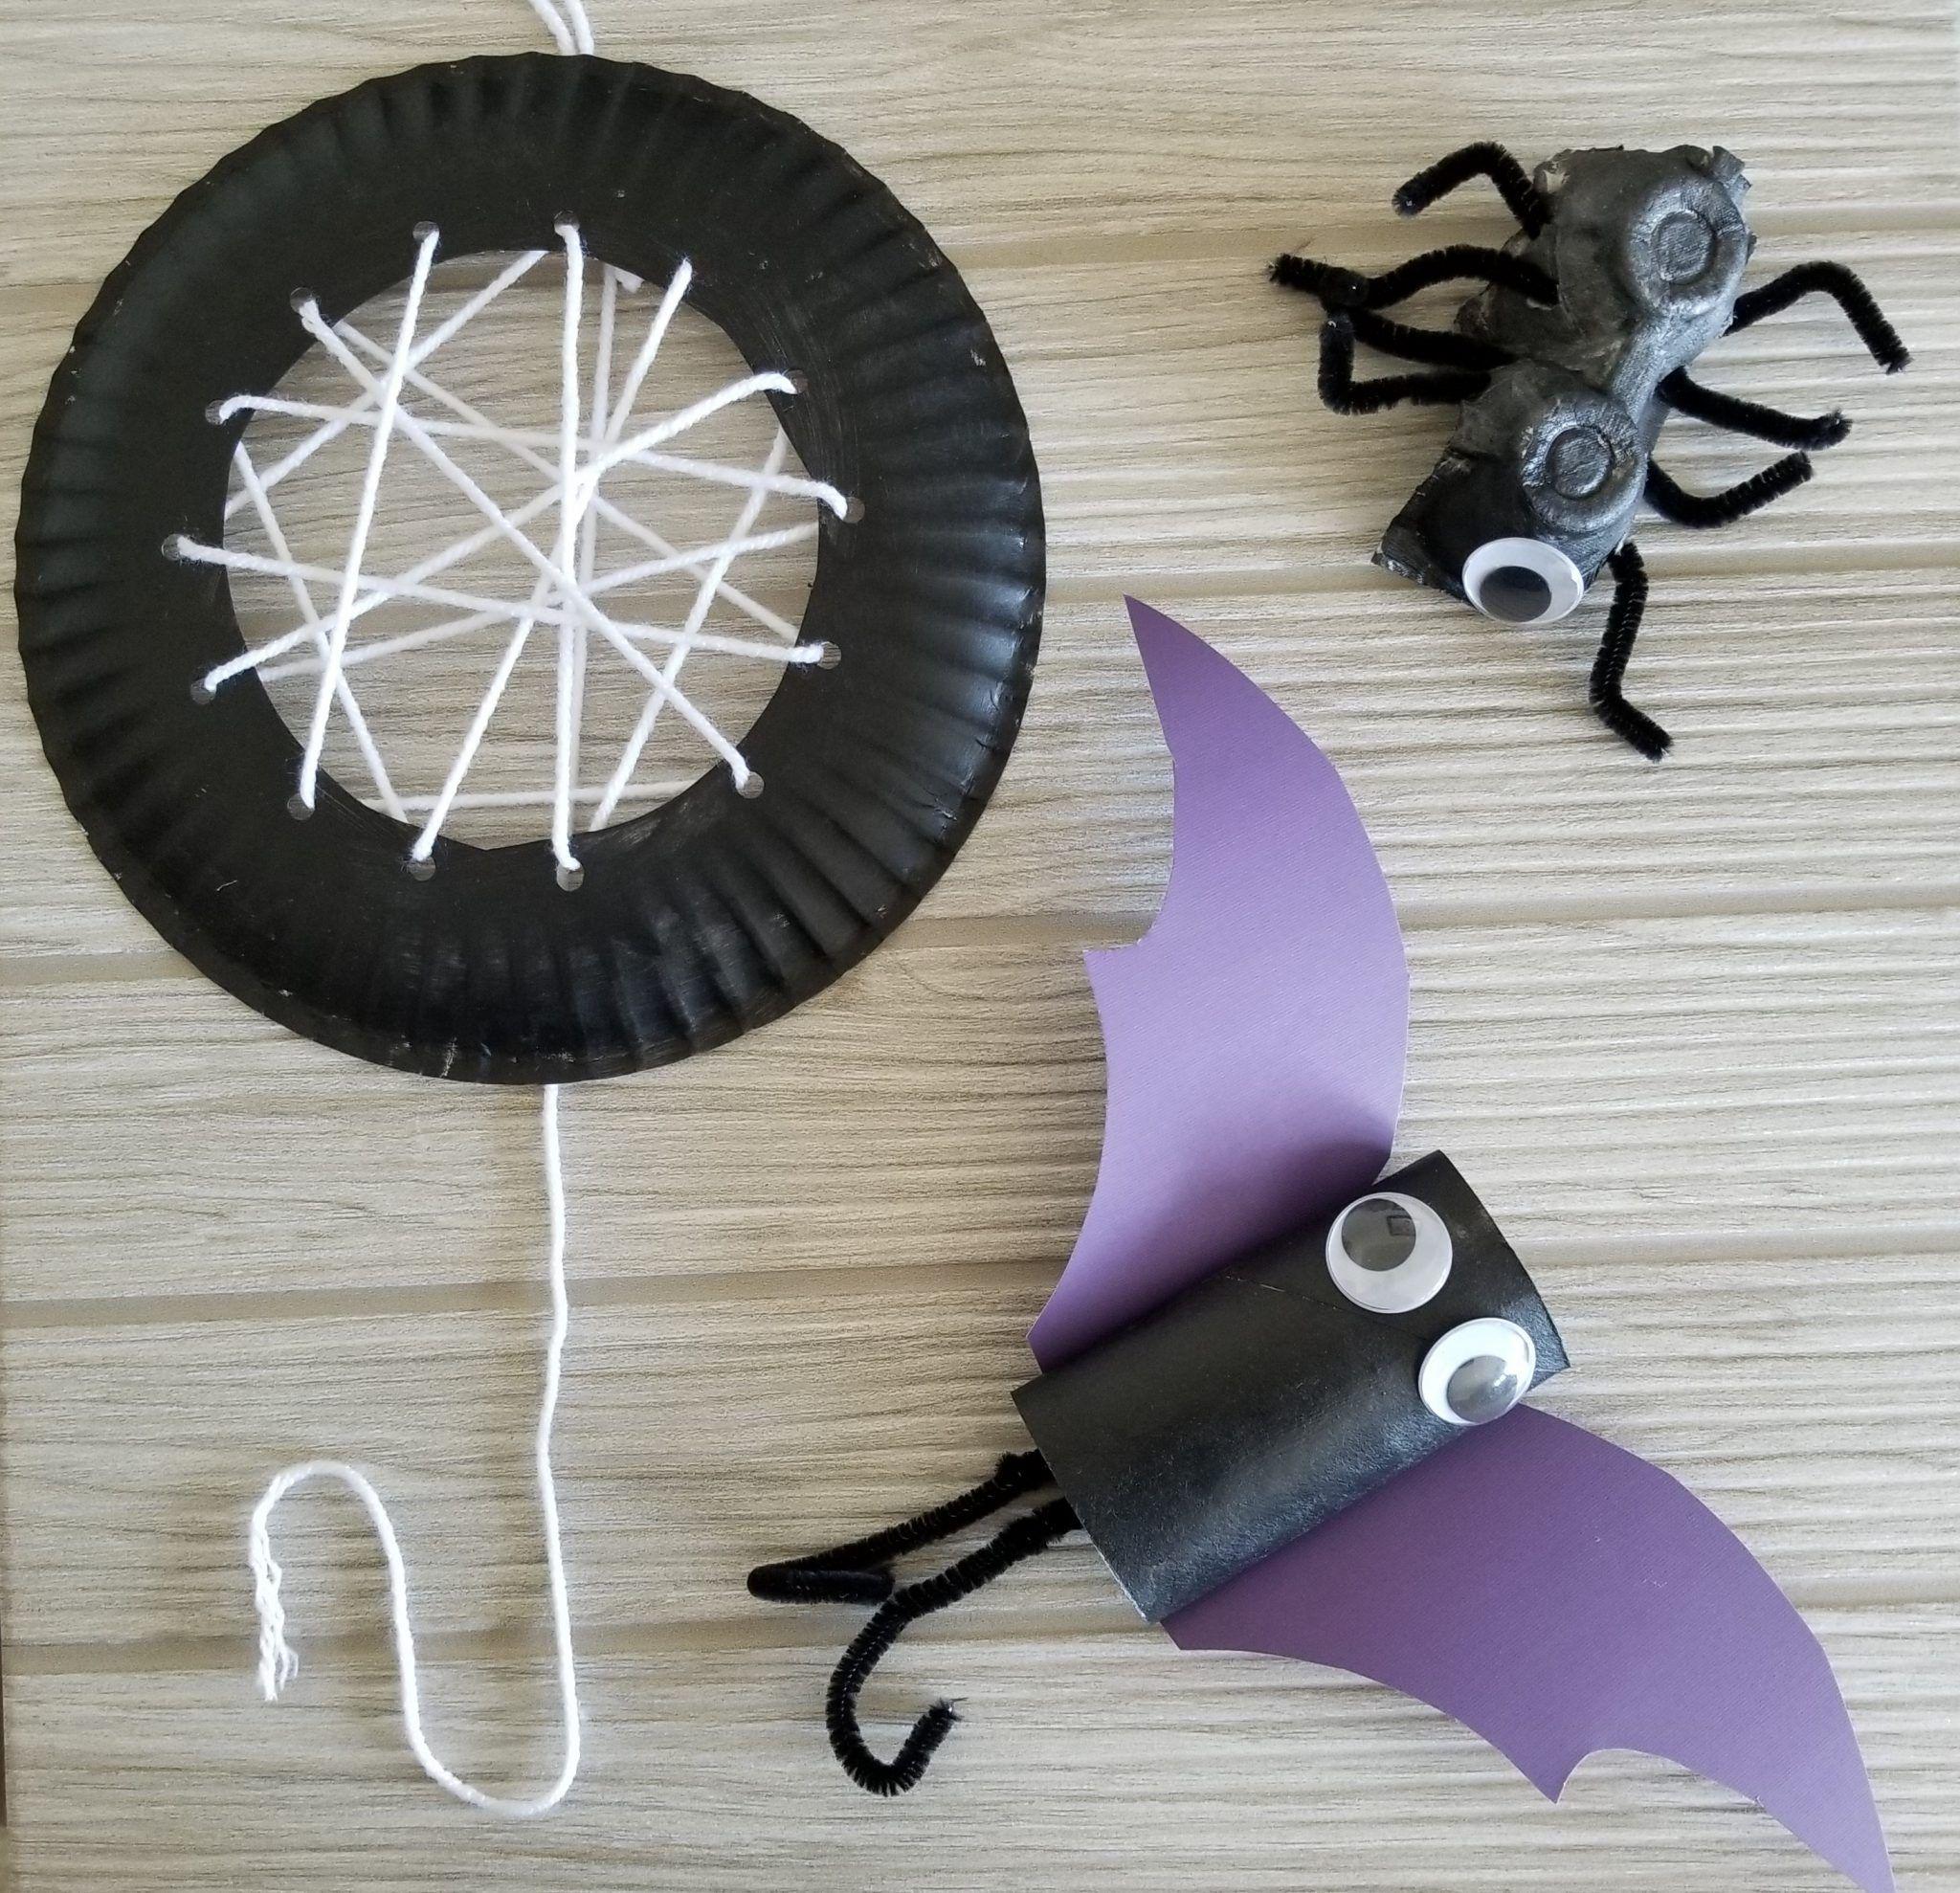 Halloween Spider And Bat Craft For Kids